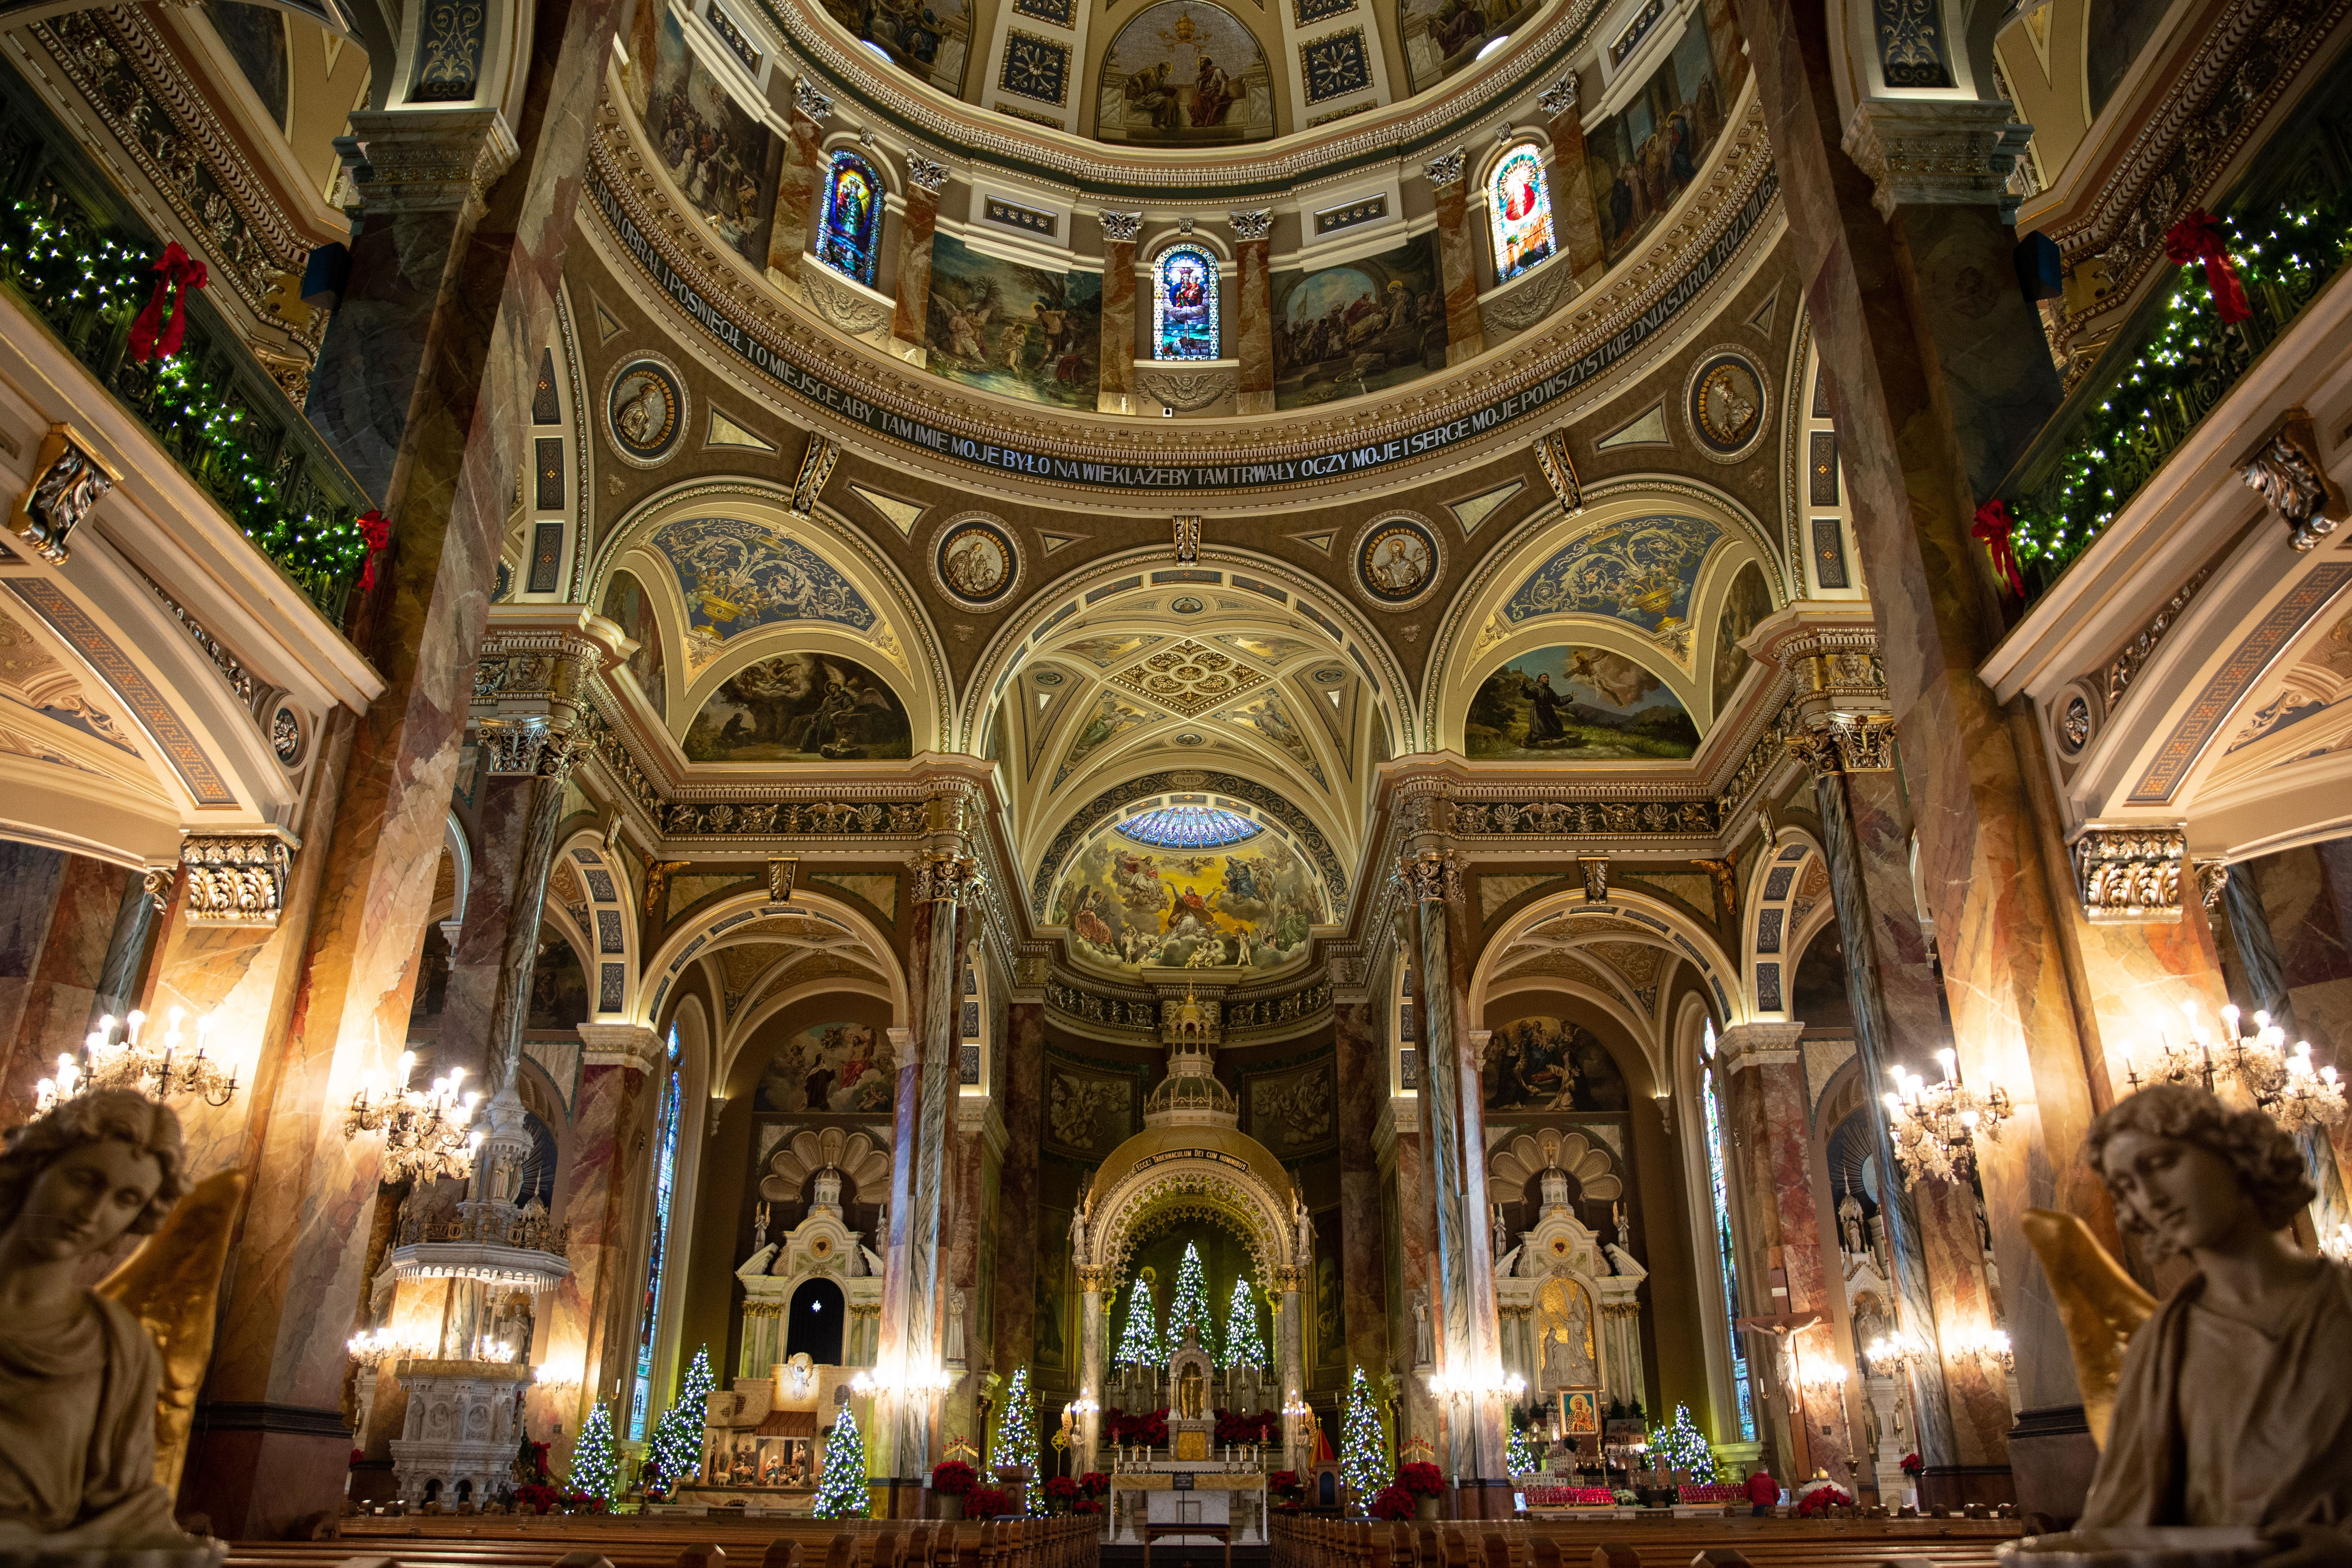 Dentro de la iglesia